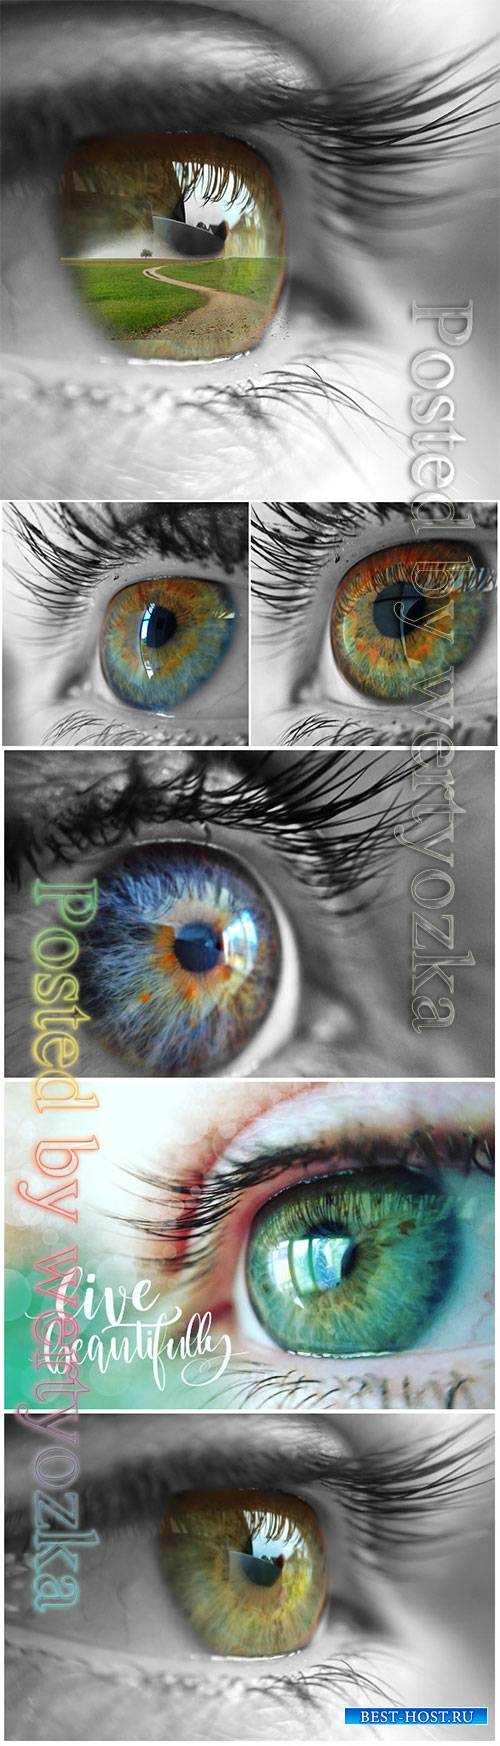 Eye beautiful stock photo